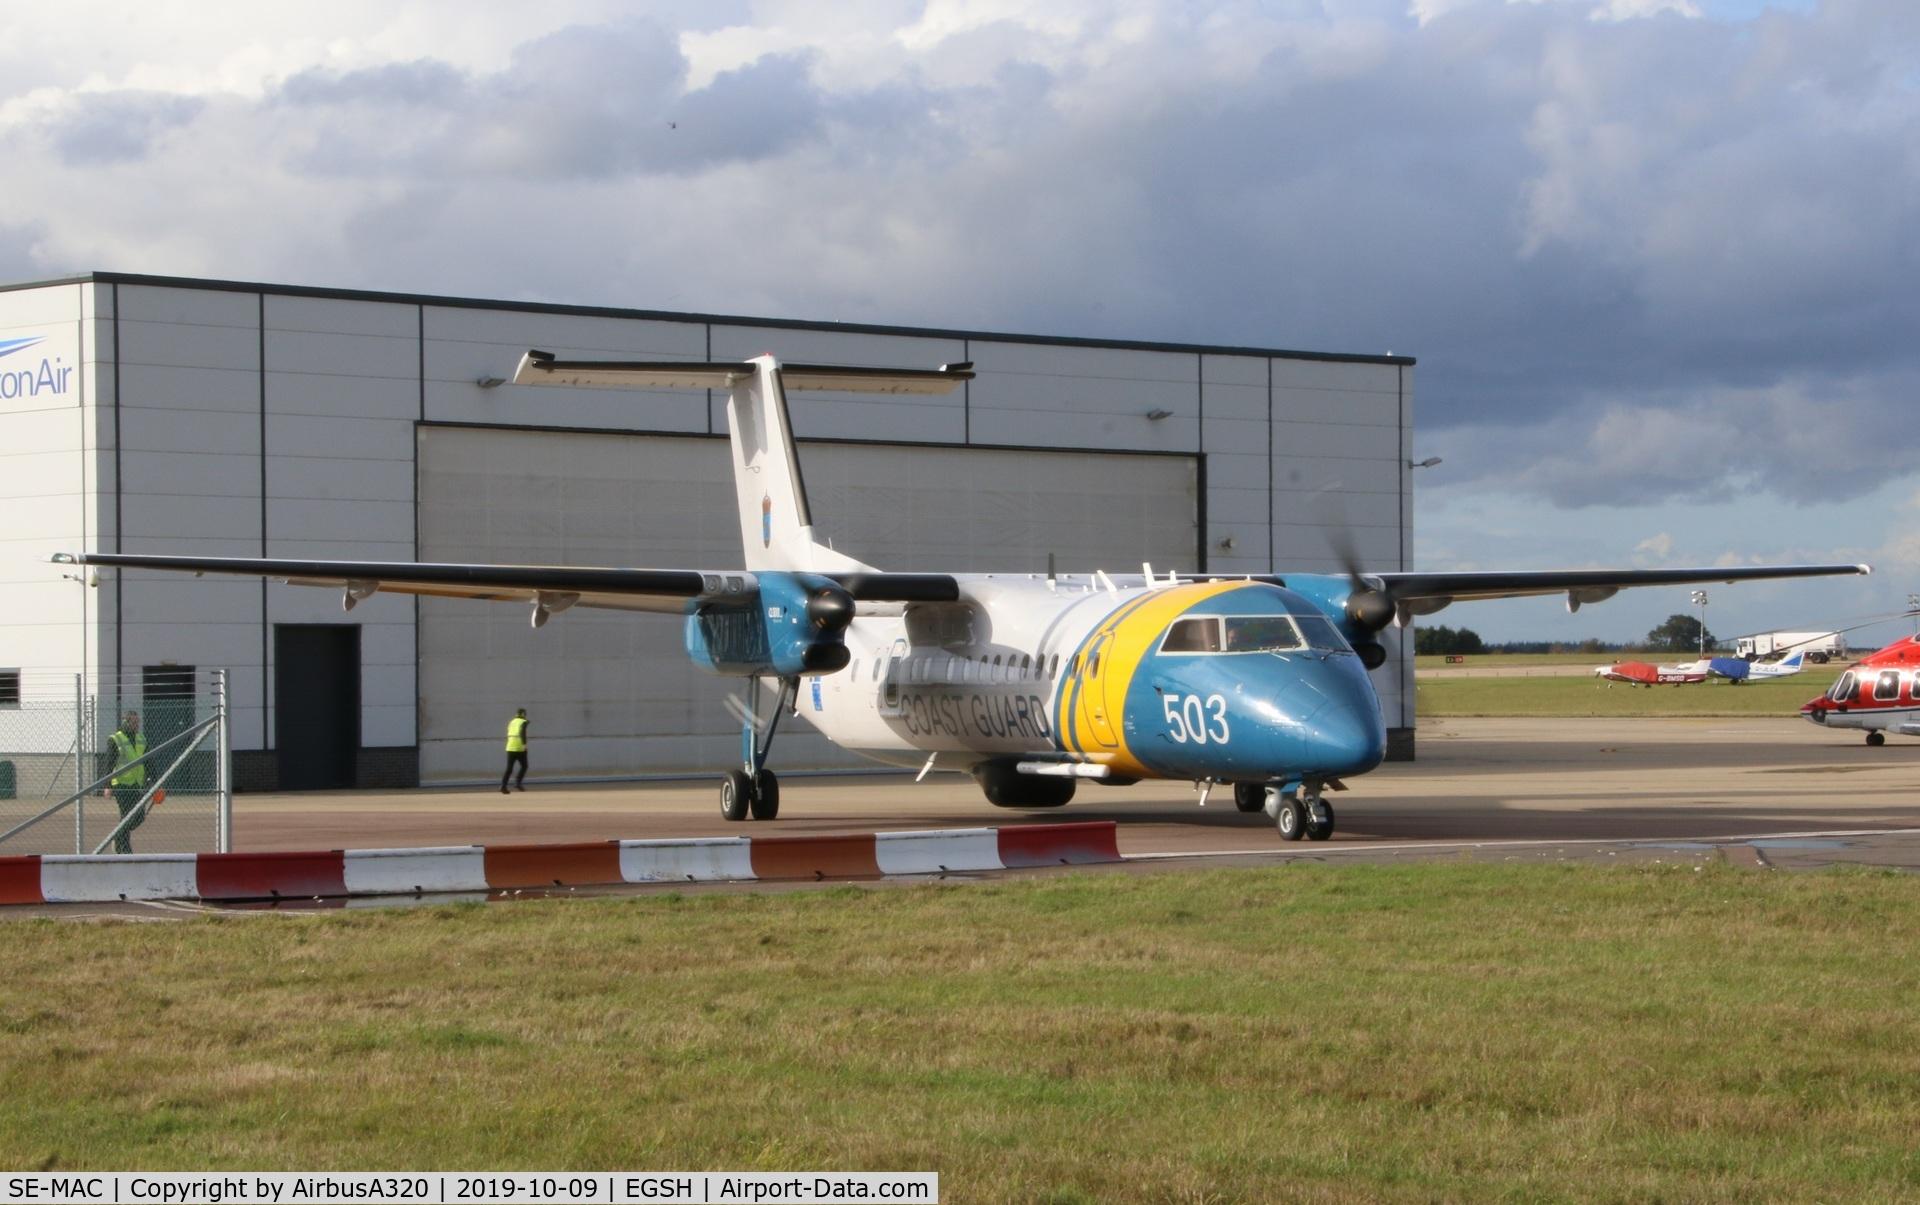 SE-MAC, 2007 De Havilland Canada DHC-8-311AQ Dash 8 C/N 638, Parked on Saxon ramp